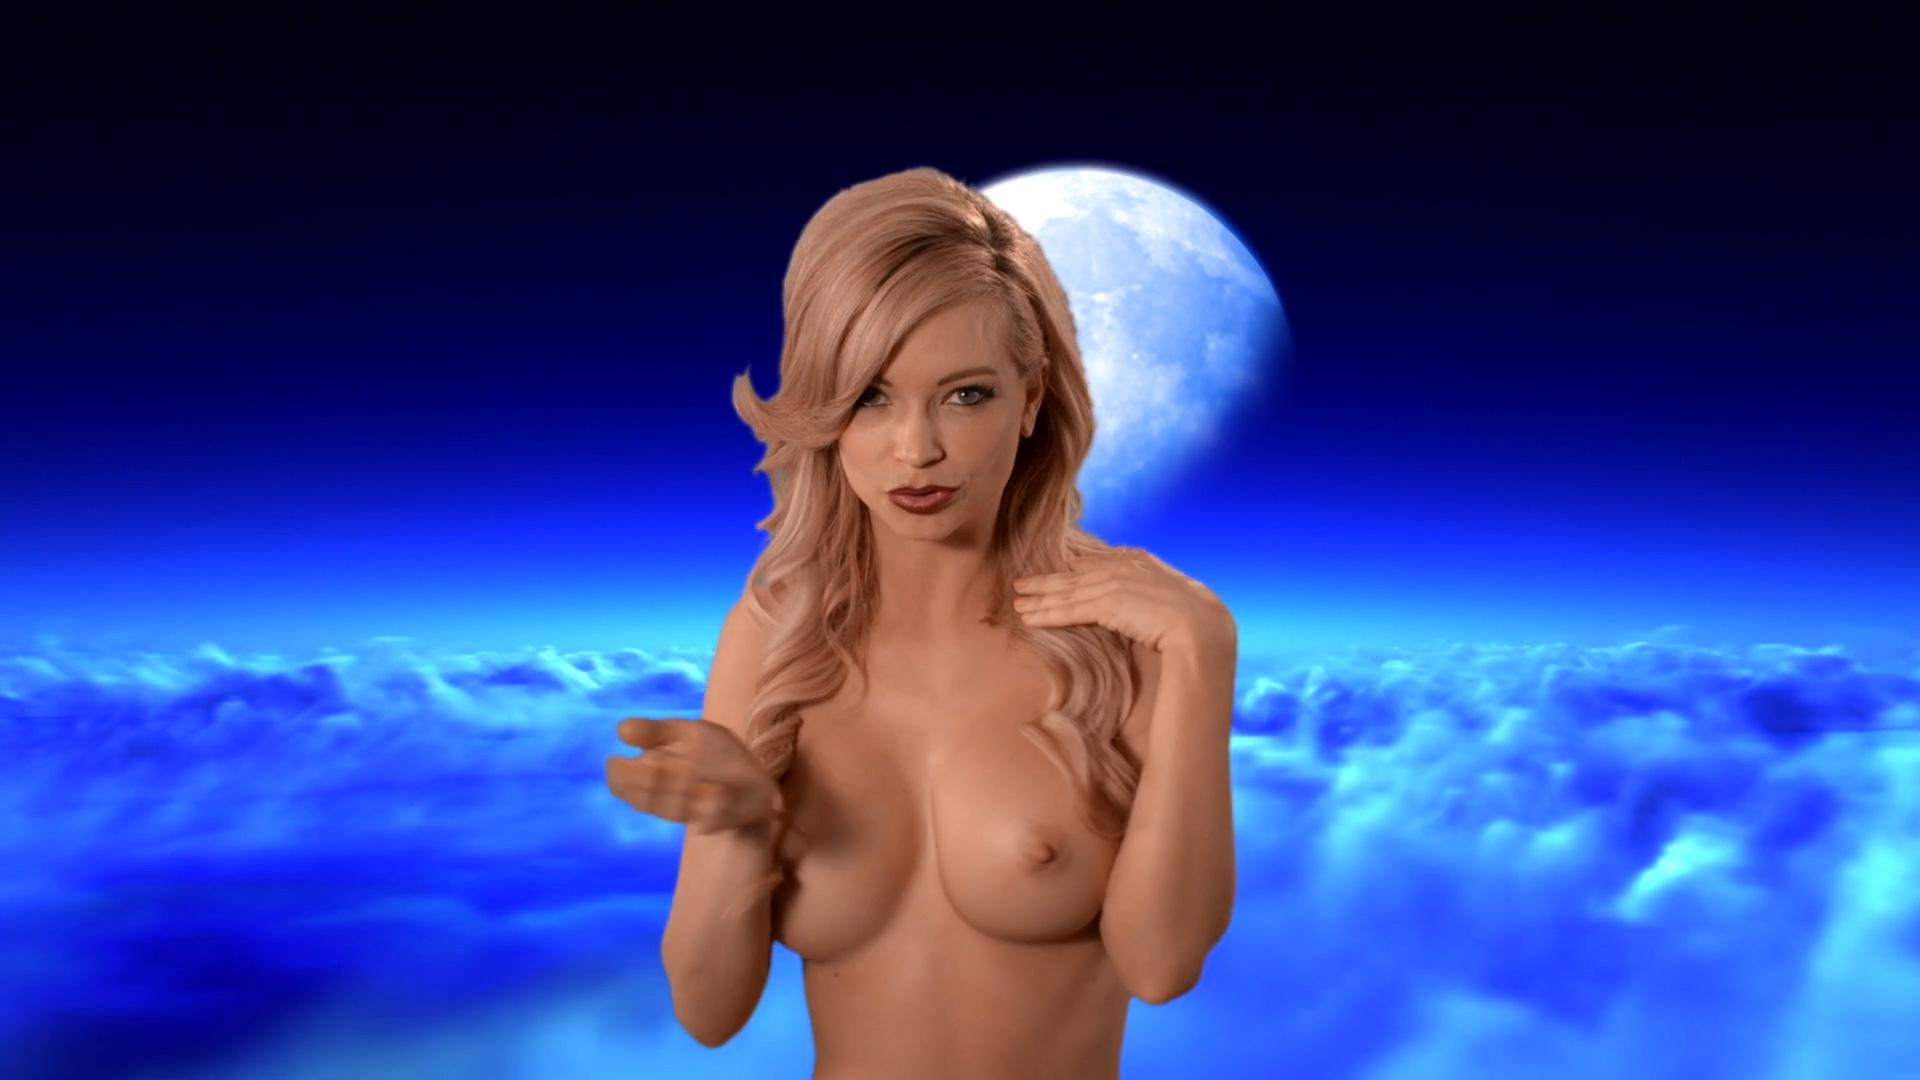 softcore porn website